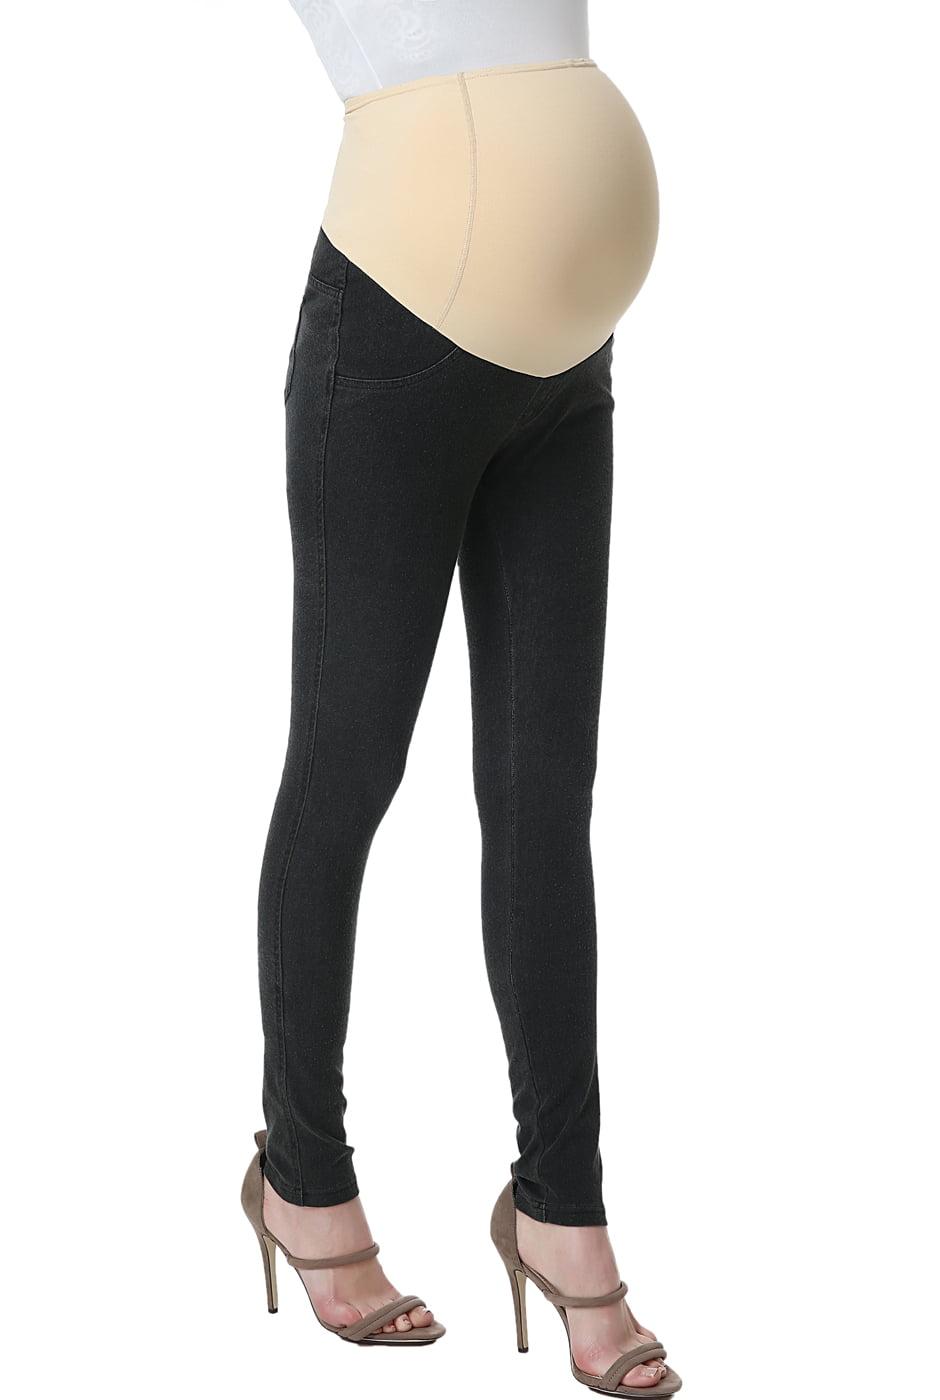 "Maternity Women's Jeggings (28.5"" Inseam) - Dark Heather Gray XL"